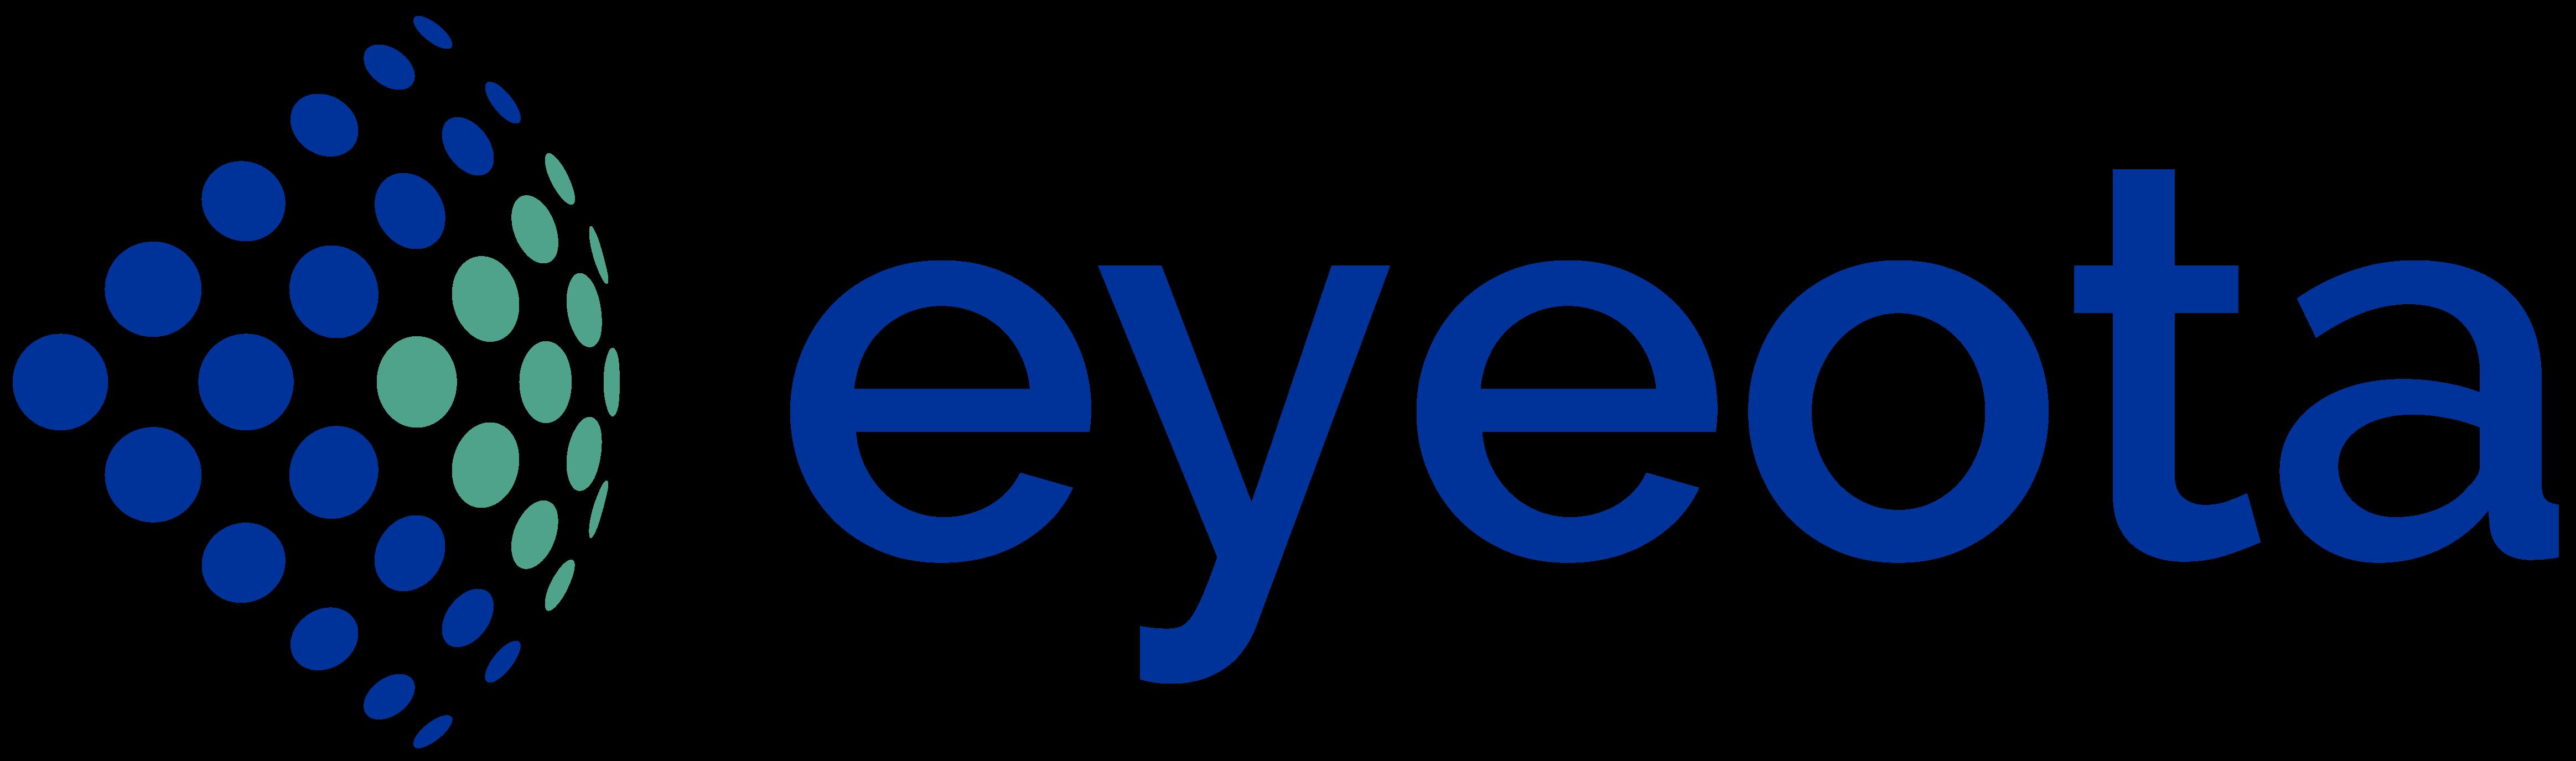 Eyeota Logo_High Res (1).png